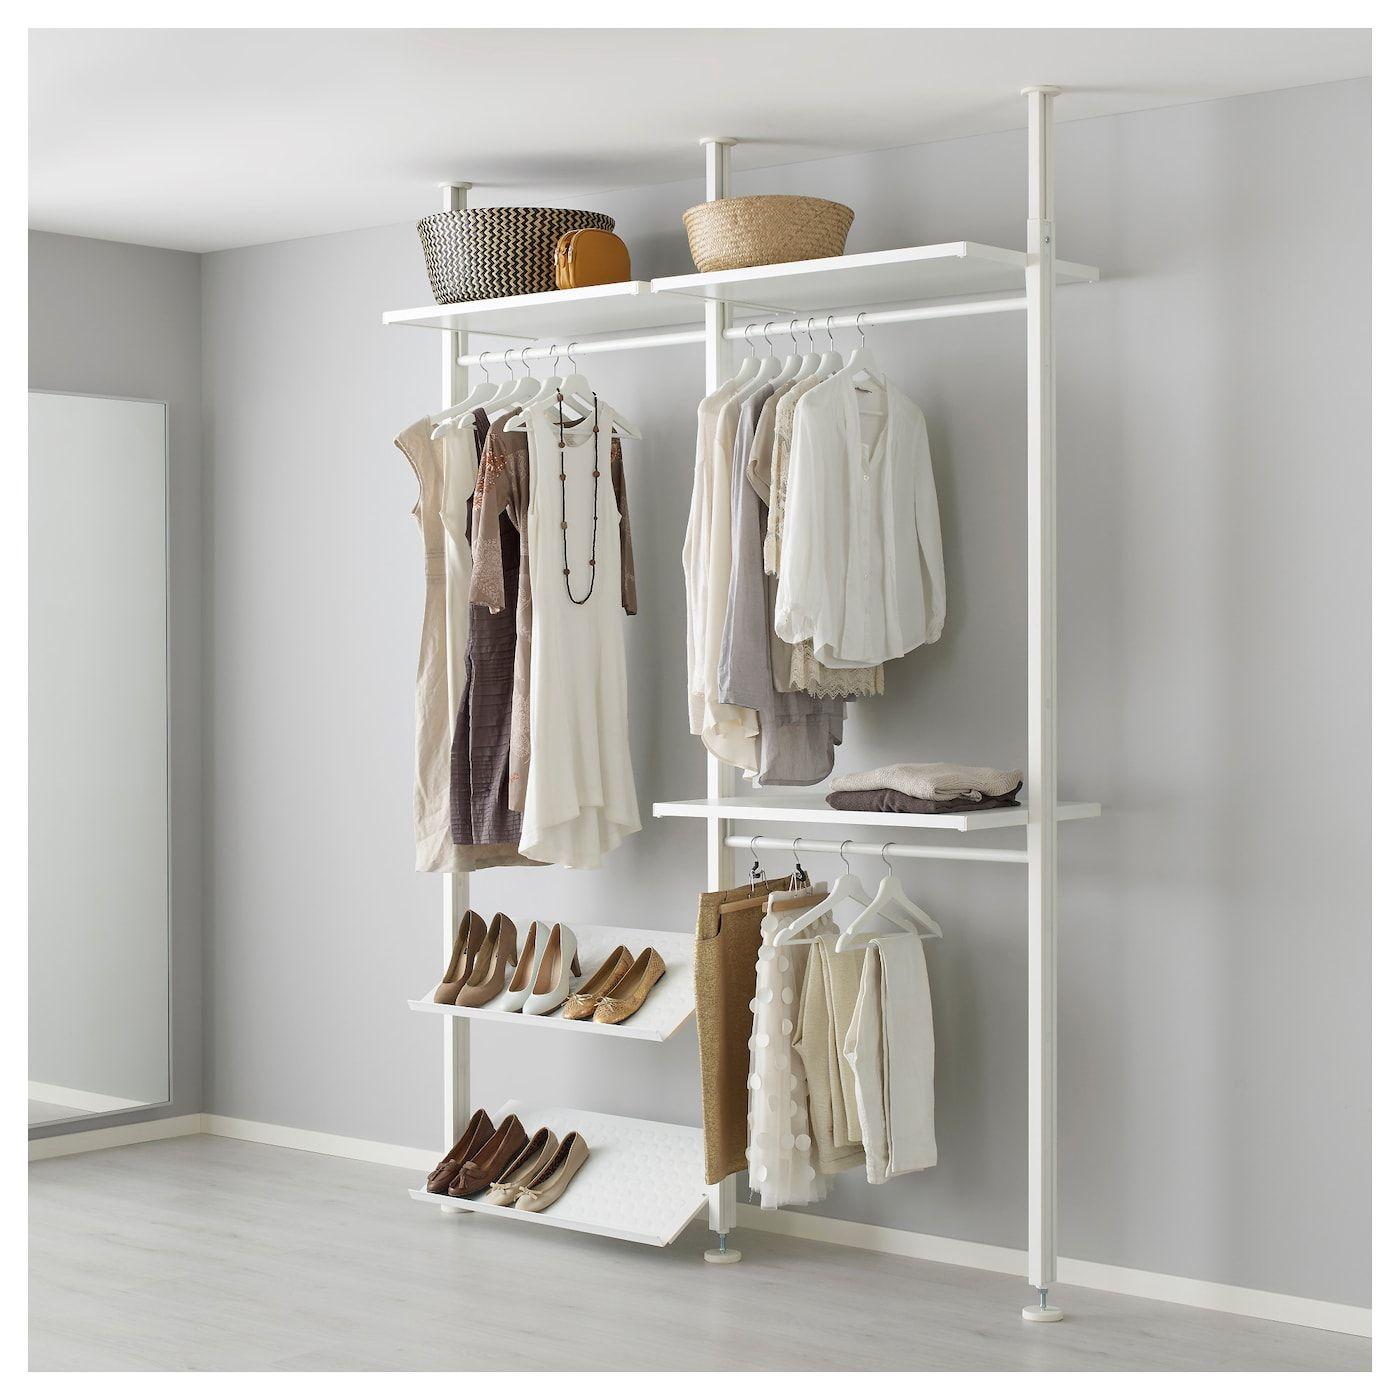 Elvarli 2 Section Shelving Unit White Width 68 7 8 Min Height 87 1 4 Order Here Ikea 寝室の棚 クローゼットシステム オープンクローゼット